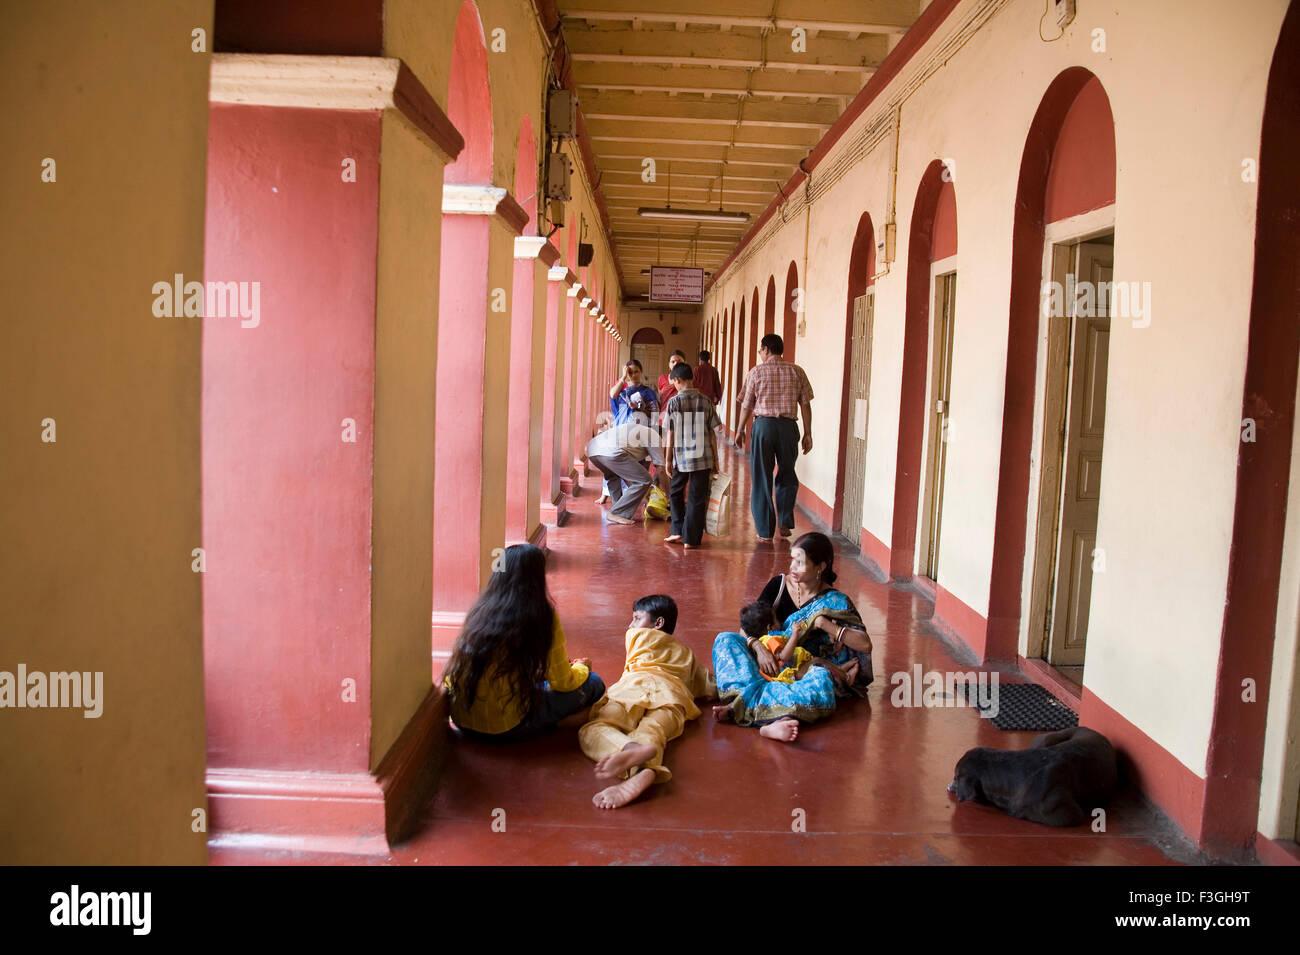 Pilgrims visited in Dakshineshwar Kali Temple Ramakrishna Paramhans was living here as priest ; Calcutta Kolkata - Stock Image